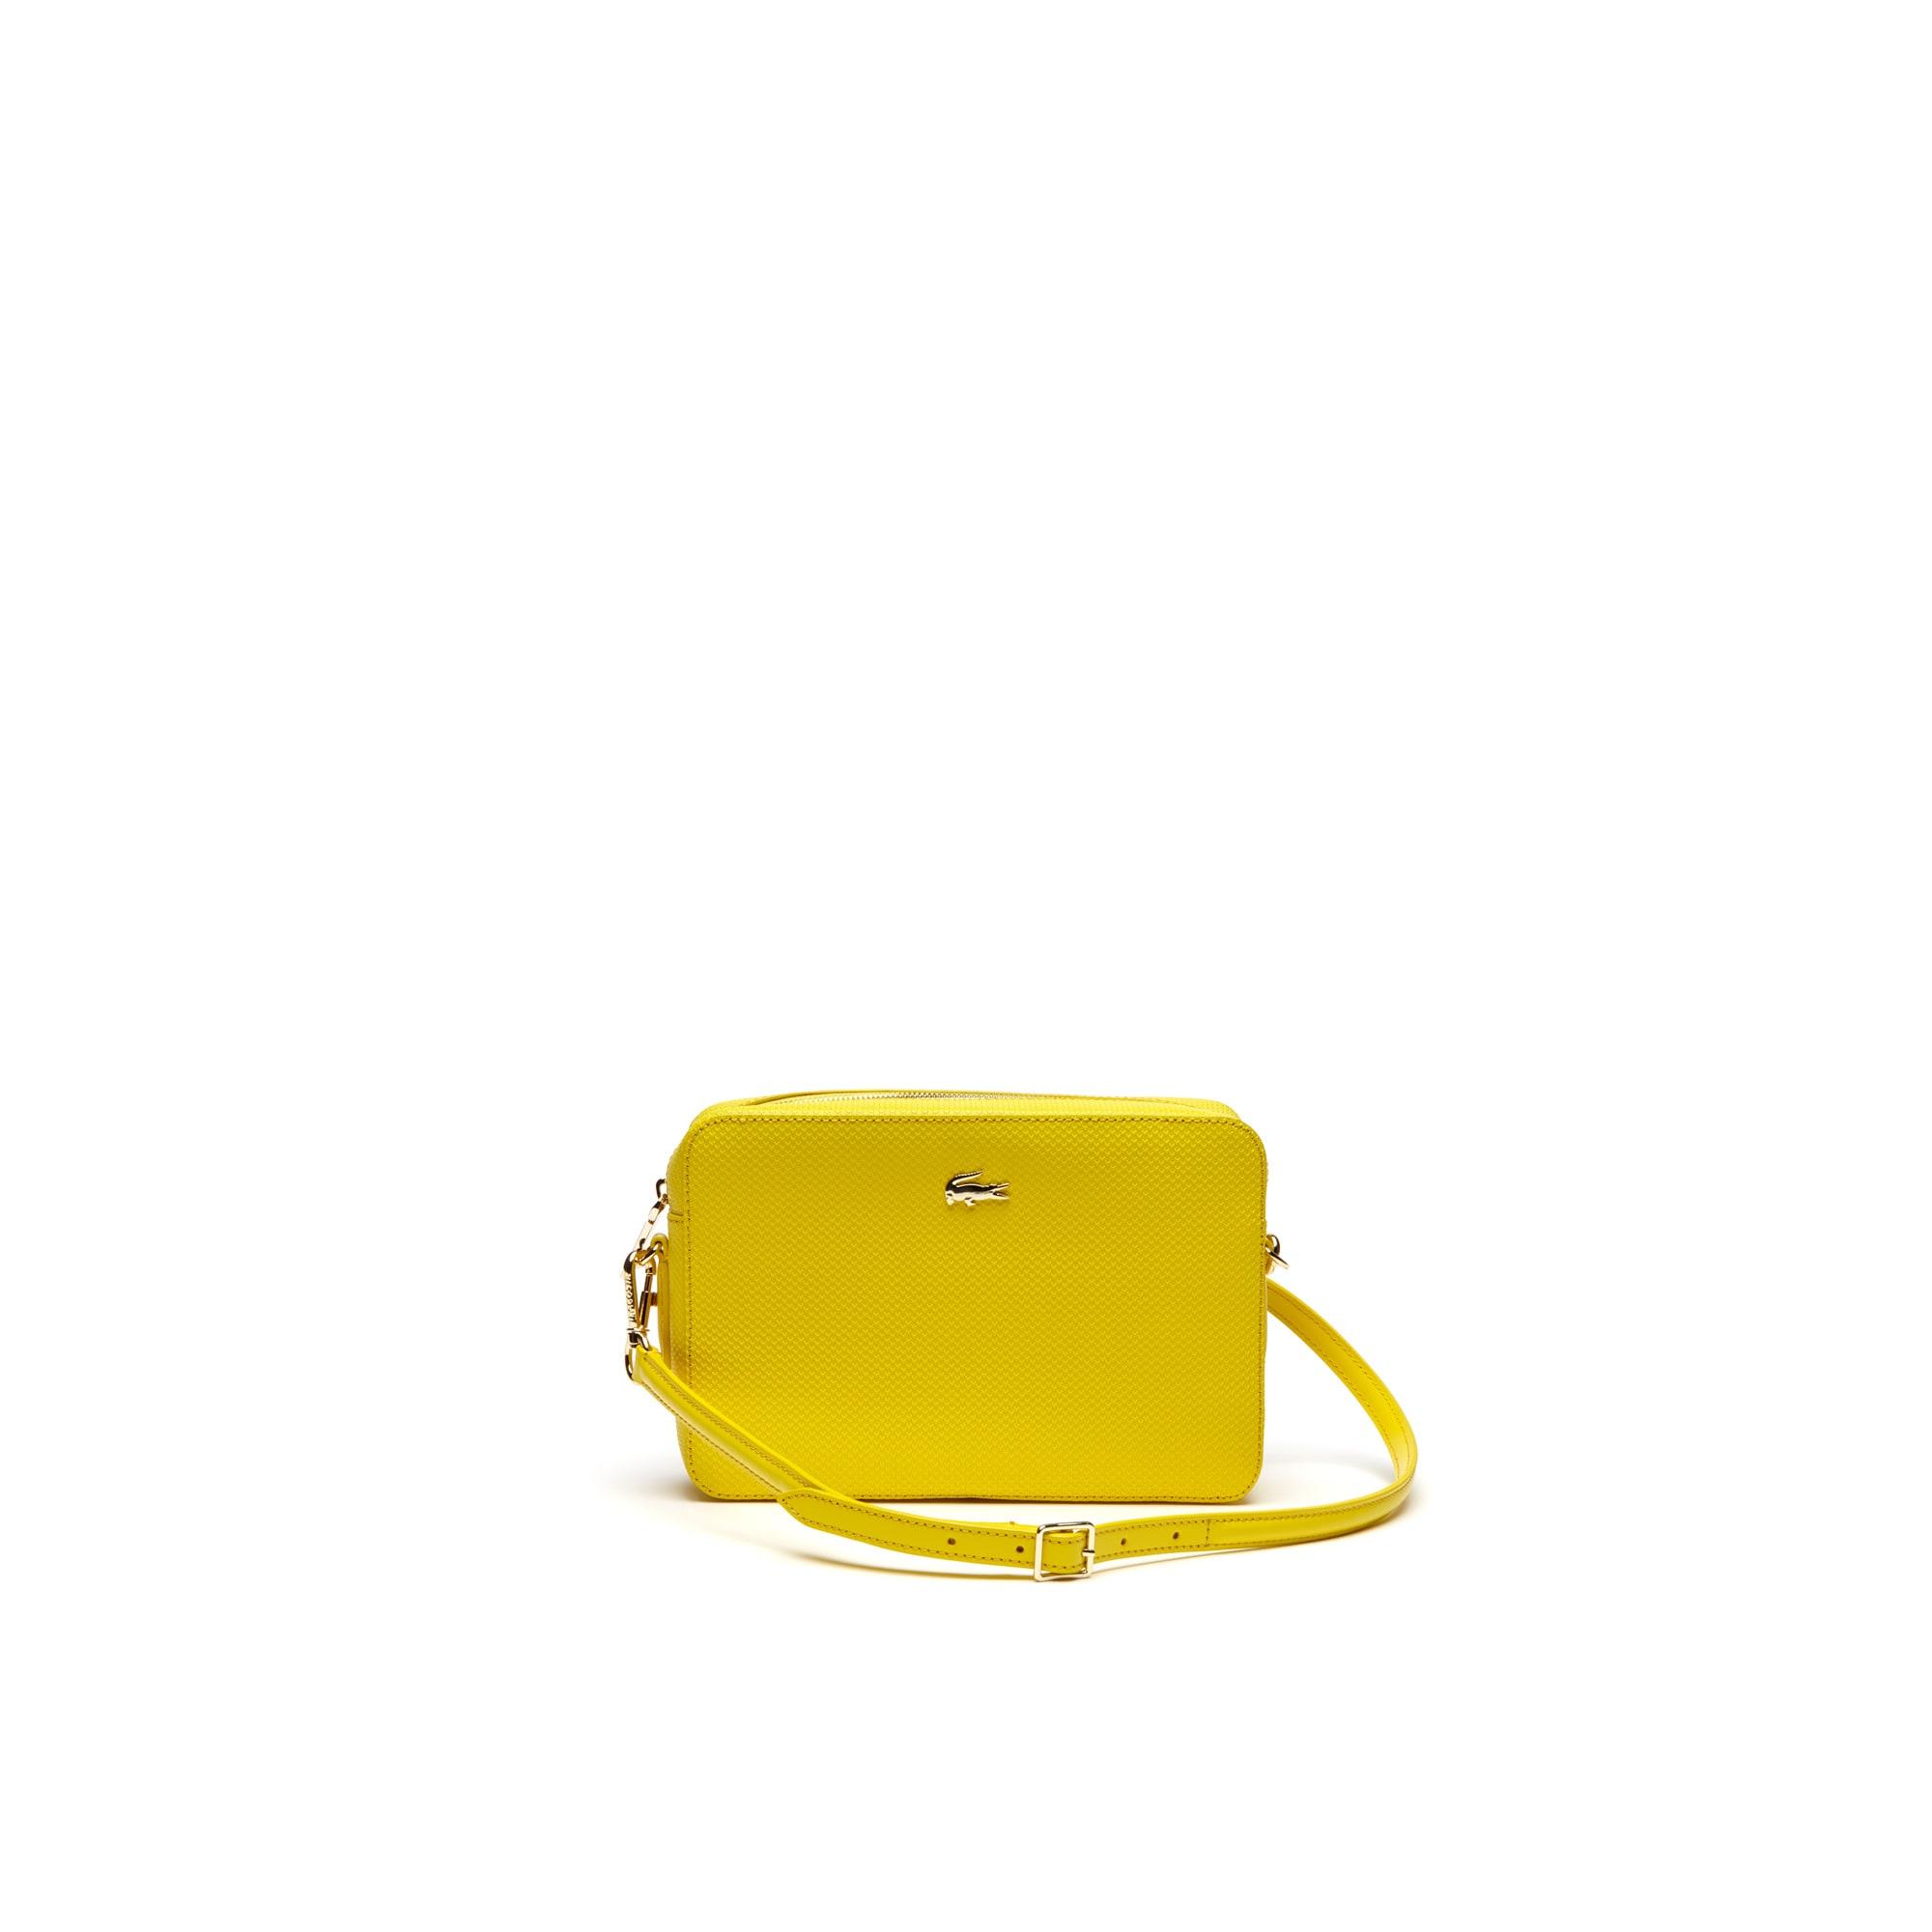 Women's Chantaco Piqué Leather Square Crossover Bag